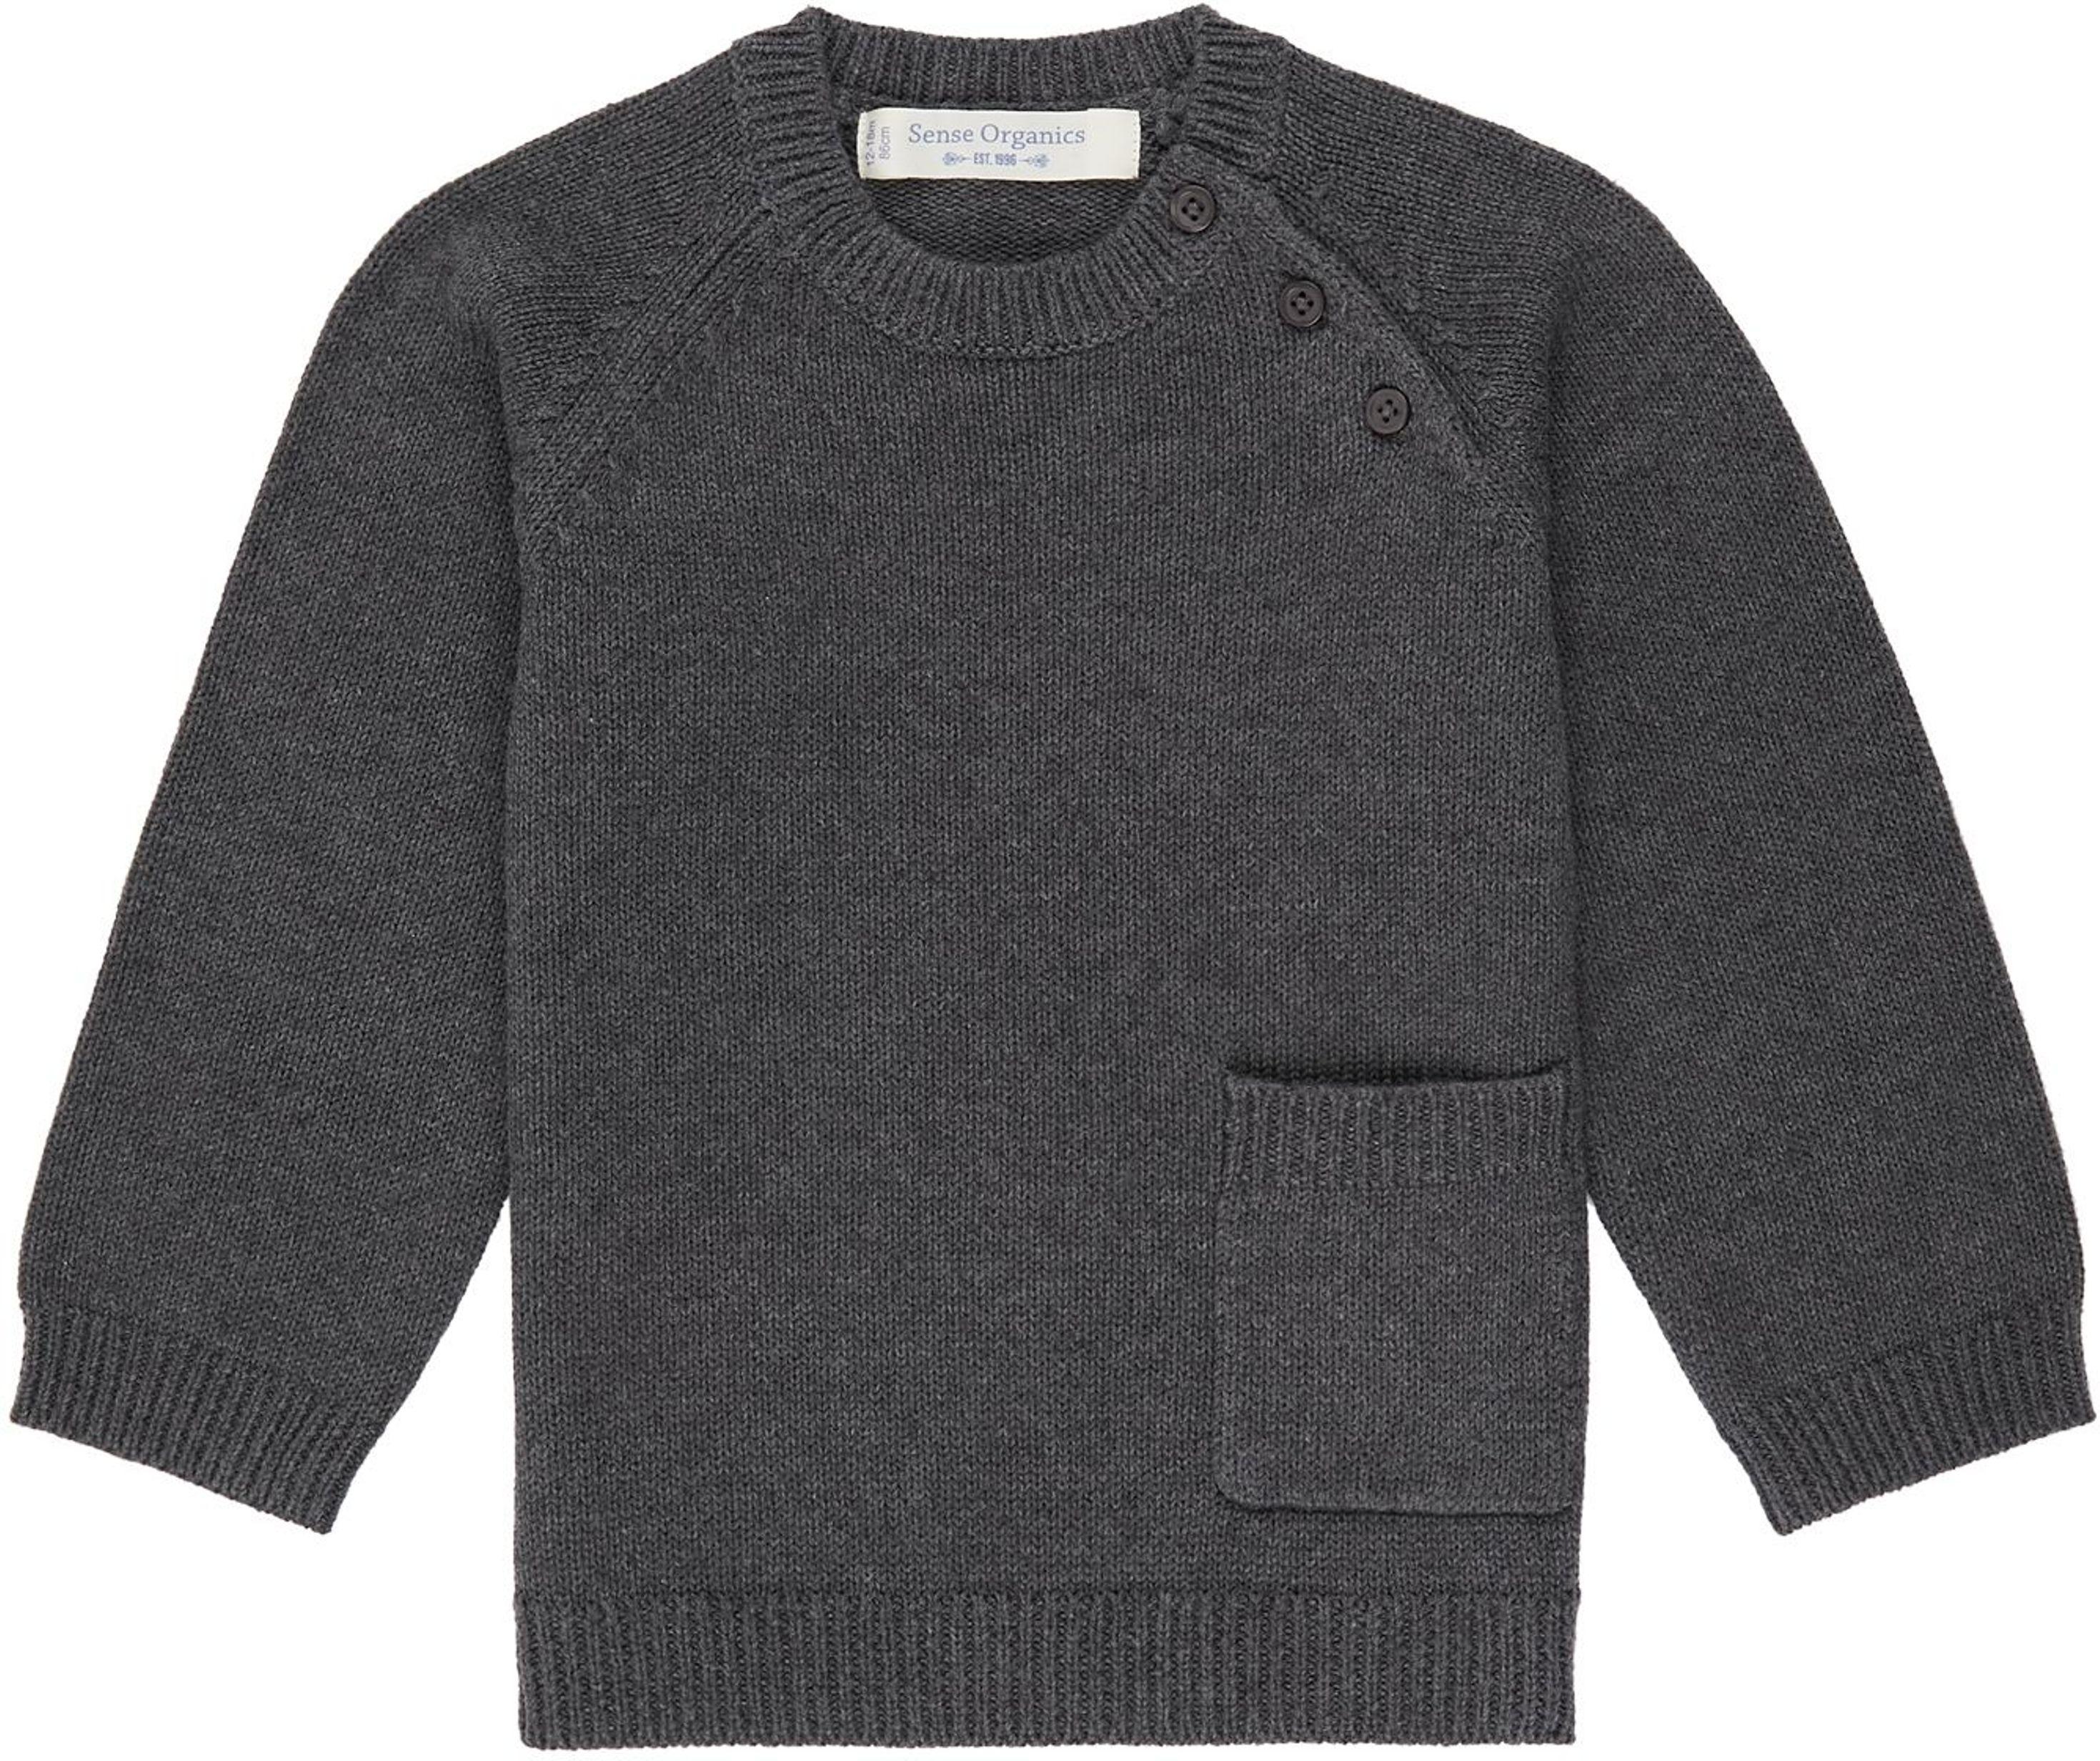 Sense Organic VICTOR Baby Knitted Sweater polar bear